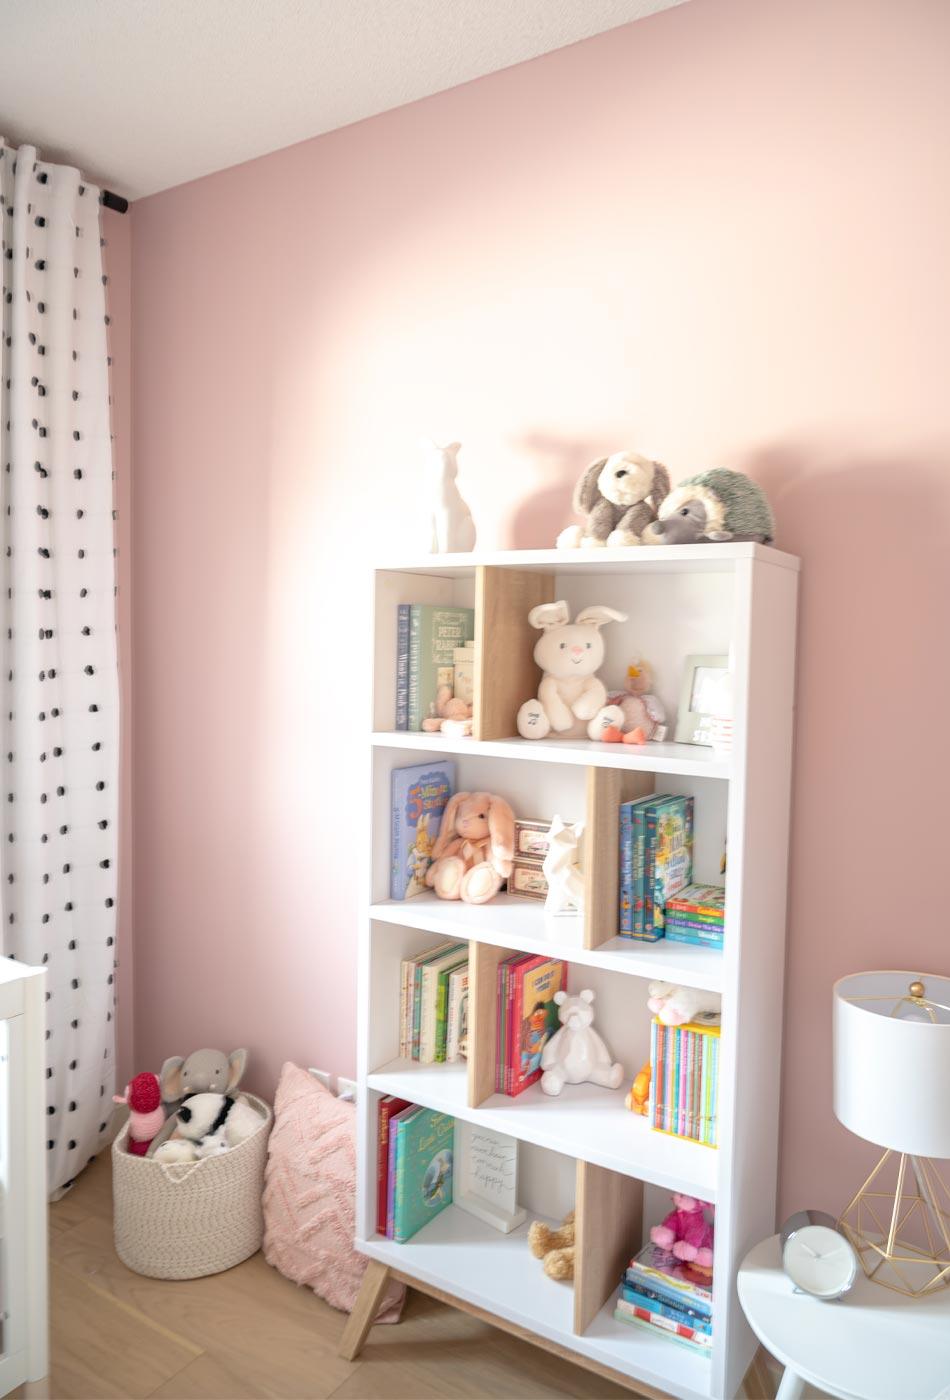 pink nursery, feminine nursery, baby girl room, baby girl nursery, white crib, white crib pink walls, pink walls nursery, modern feminine nursery, modern girls room, modern baby girl room, pompom curtains nursery, IKEA PAX Wardrobe hack, IKEA PAX Wardrobe nursery closet, nursery book case, baby room bookcase, midcentury modern bookcase